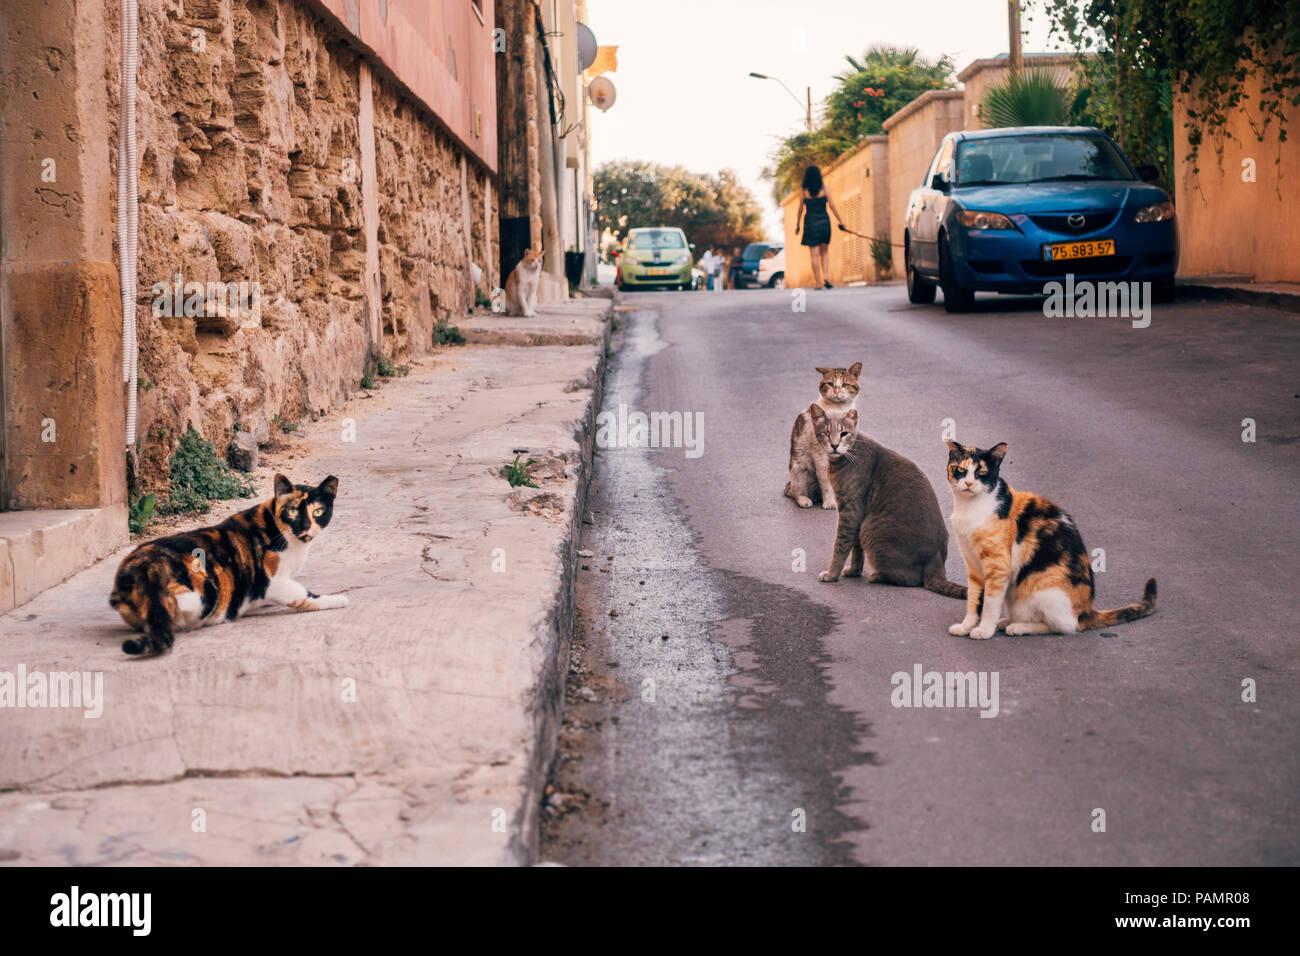 four stray cats eye the camera on a sleepy street in Jaffa, Israel - Stock Image